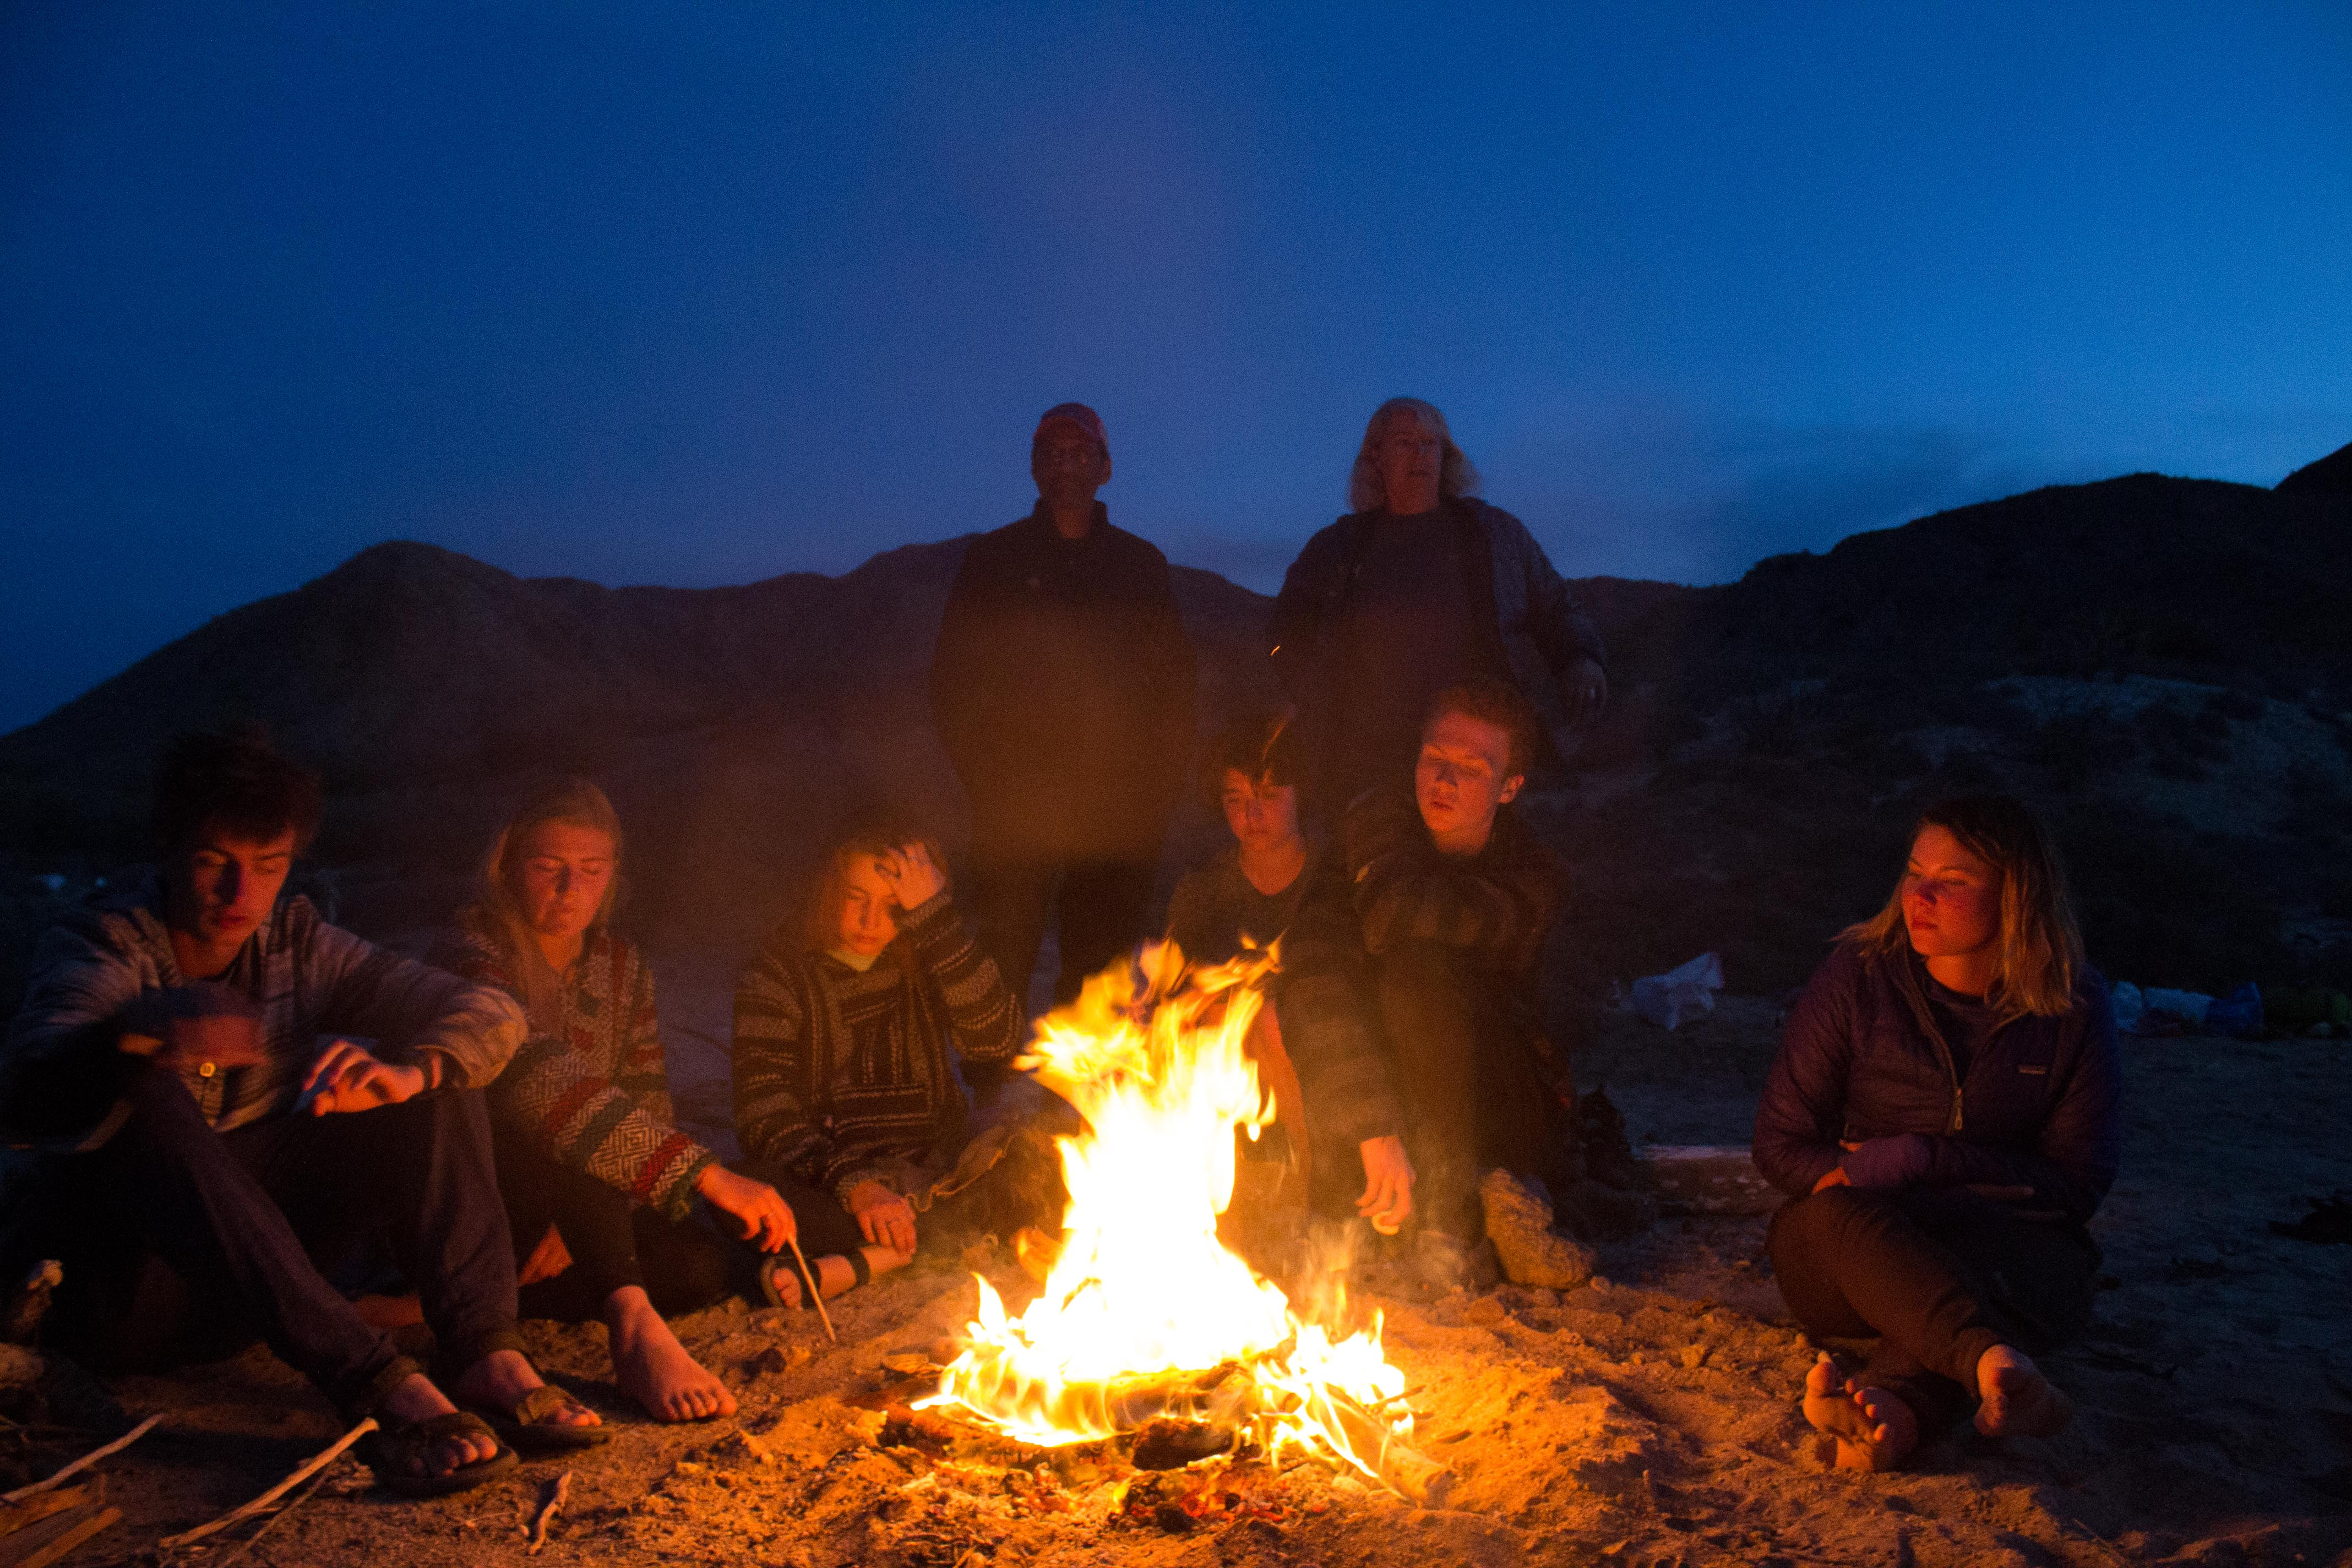 Proctor Academy Mountain Classroom Study Abroad Program-12.jpg